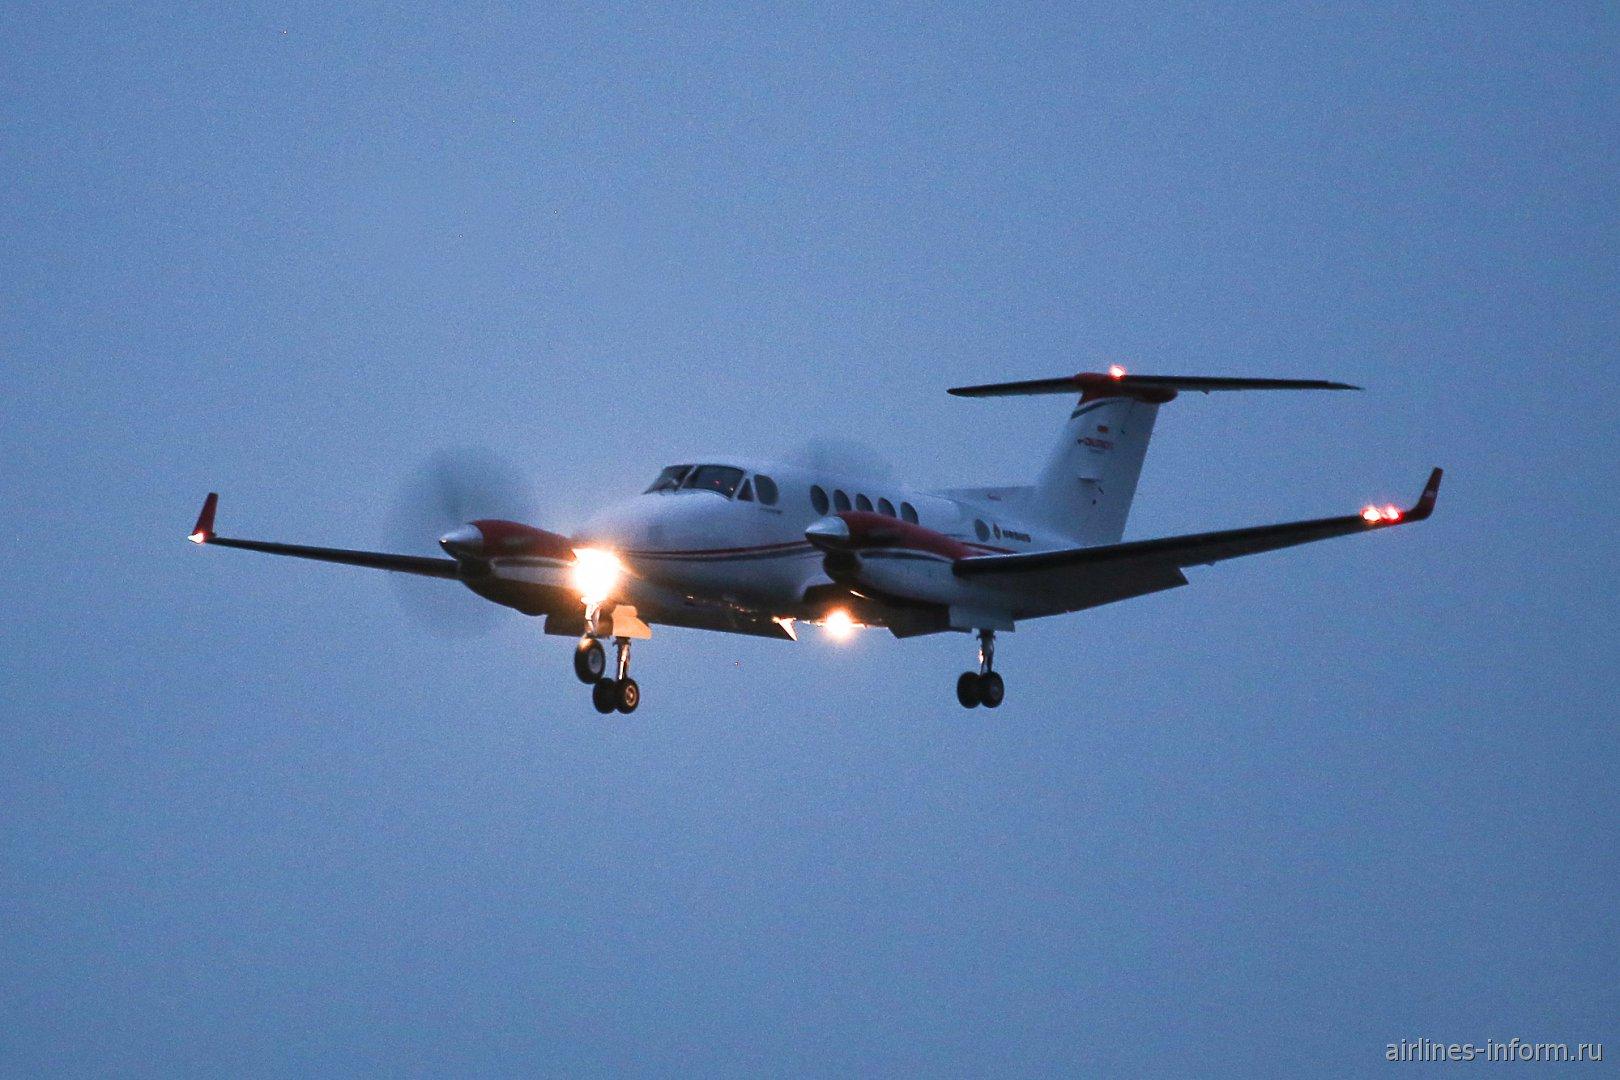 Самолет Beechcraft King Air заходит на посадку в Зальцбурге